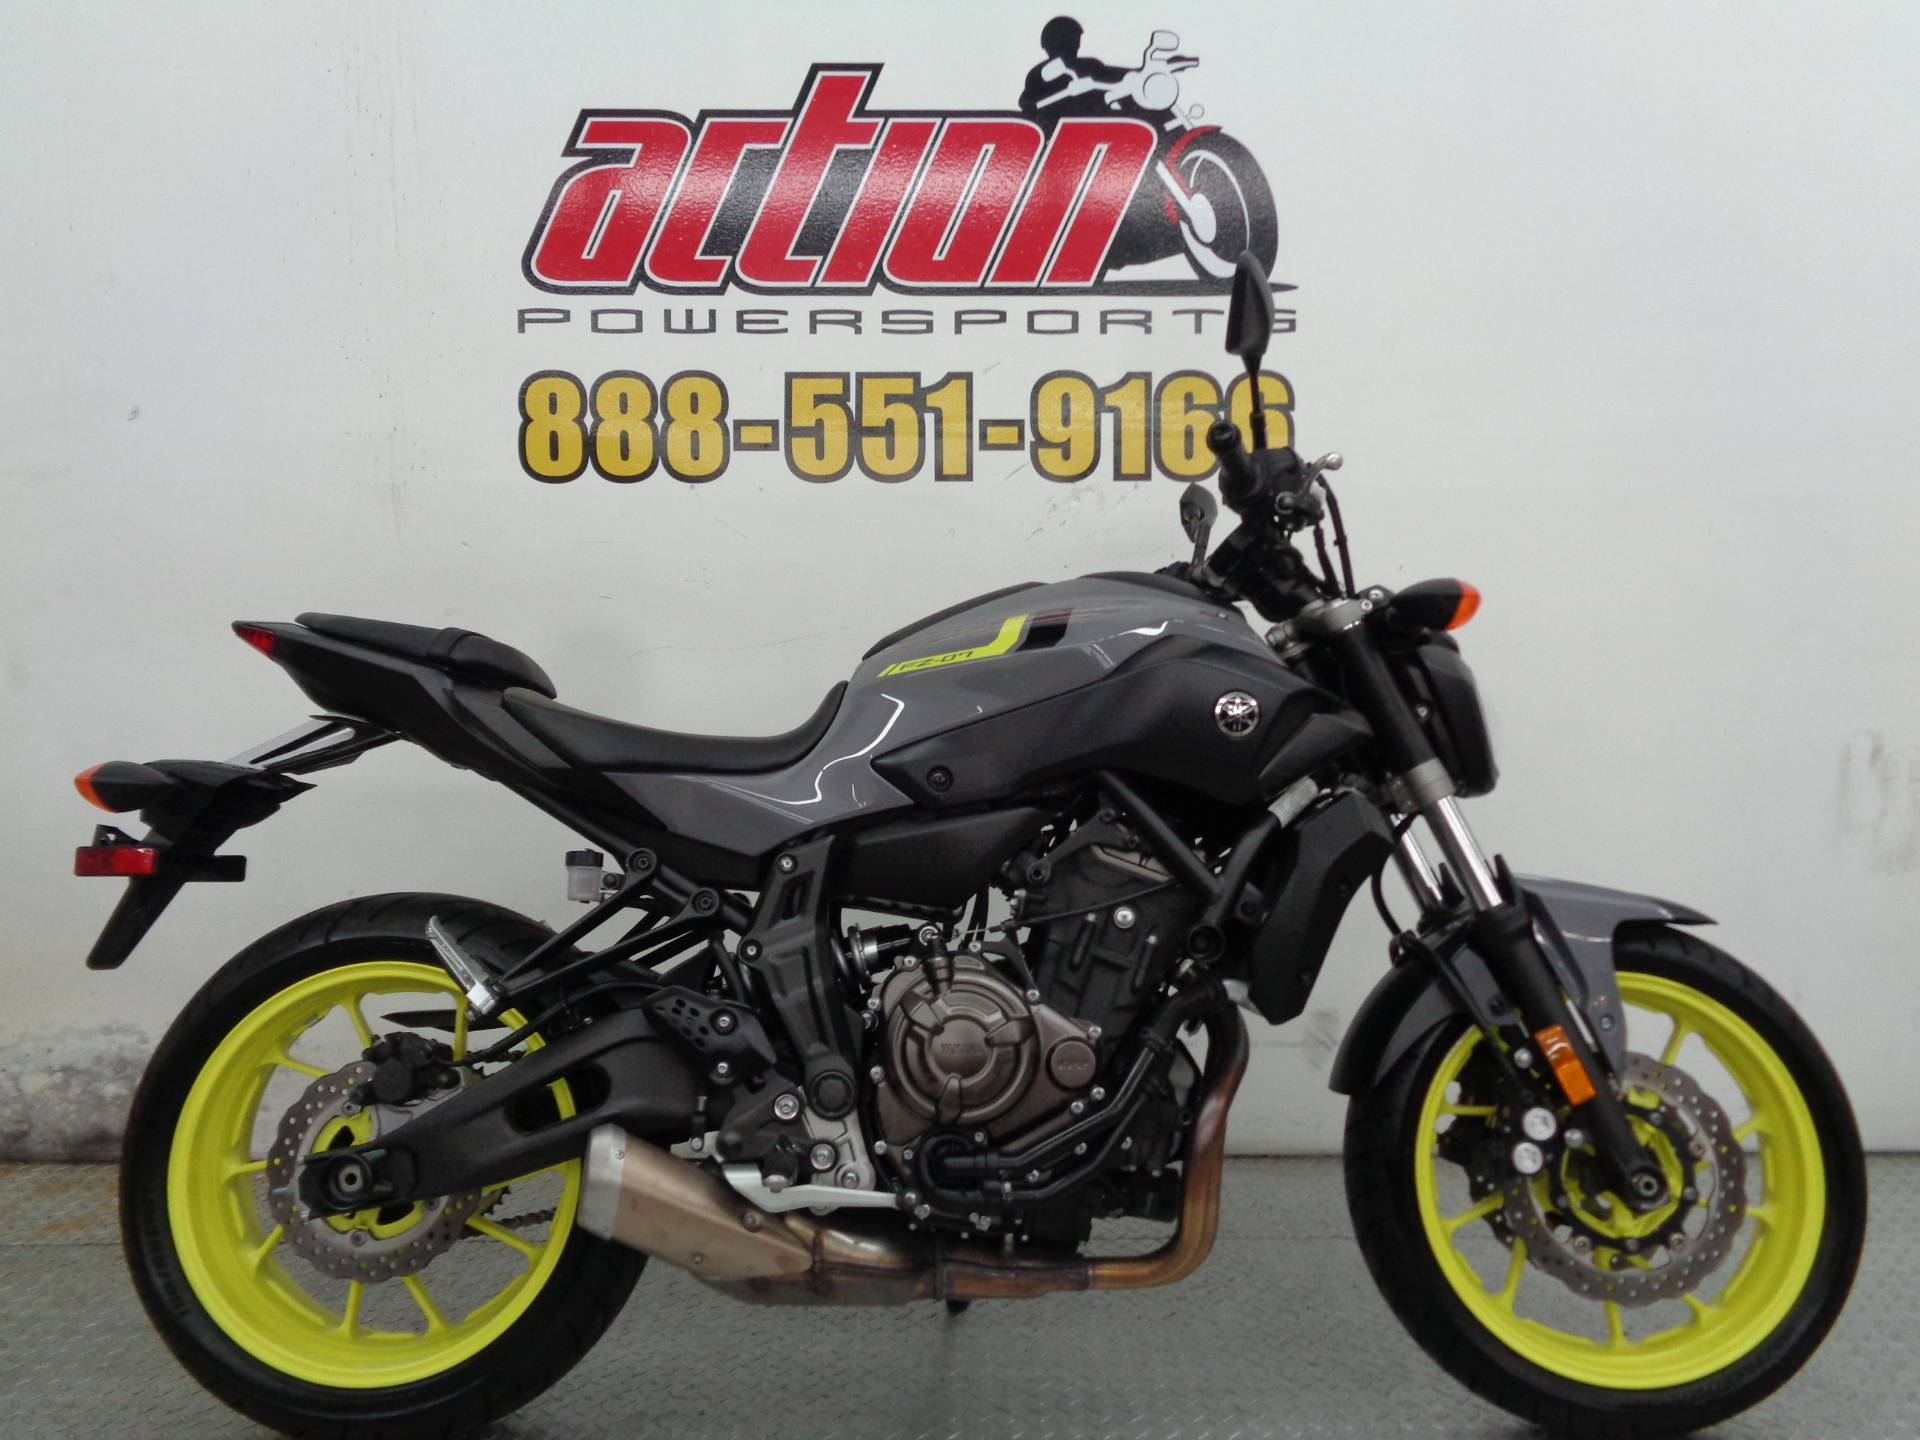 2016 Yamaha FZ-07 for sale 65753